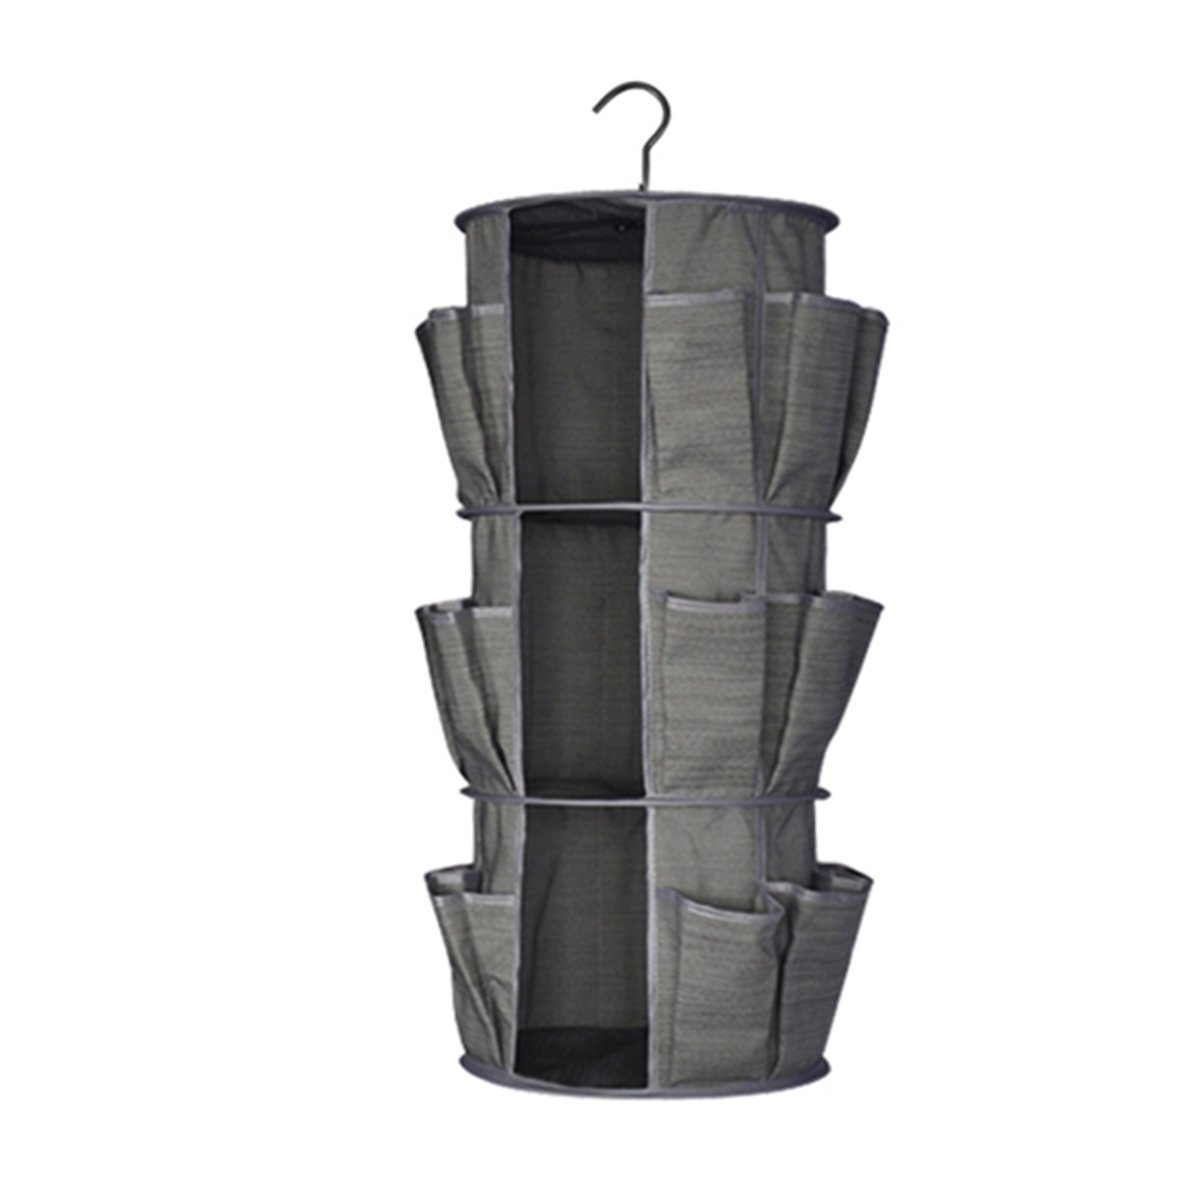 ARHSSZY 3 Tiers 18 Pockets Folding Cation Closet Storage Bag 360° Carousel Wardrobe Hanging Organizer Clothing Sundries Holder Bag Sorting Hanger